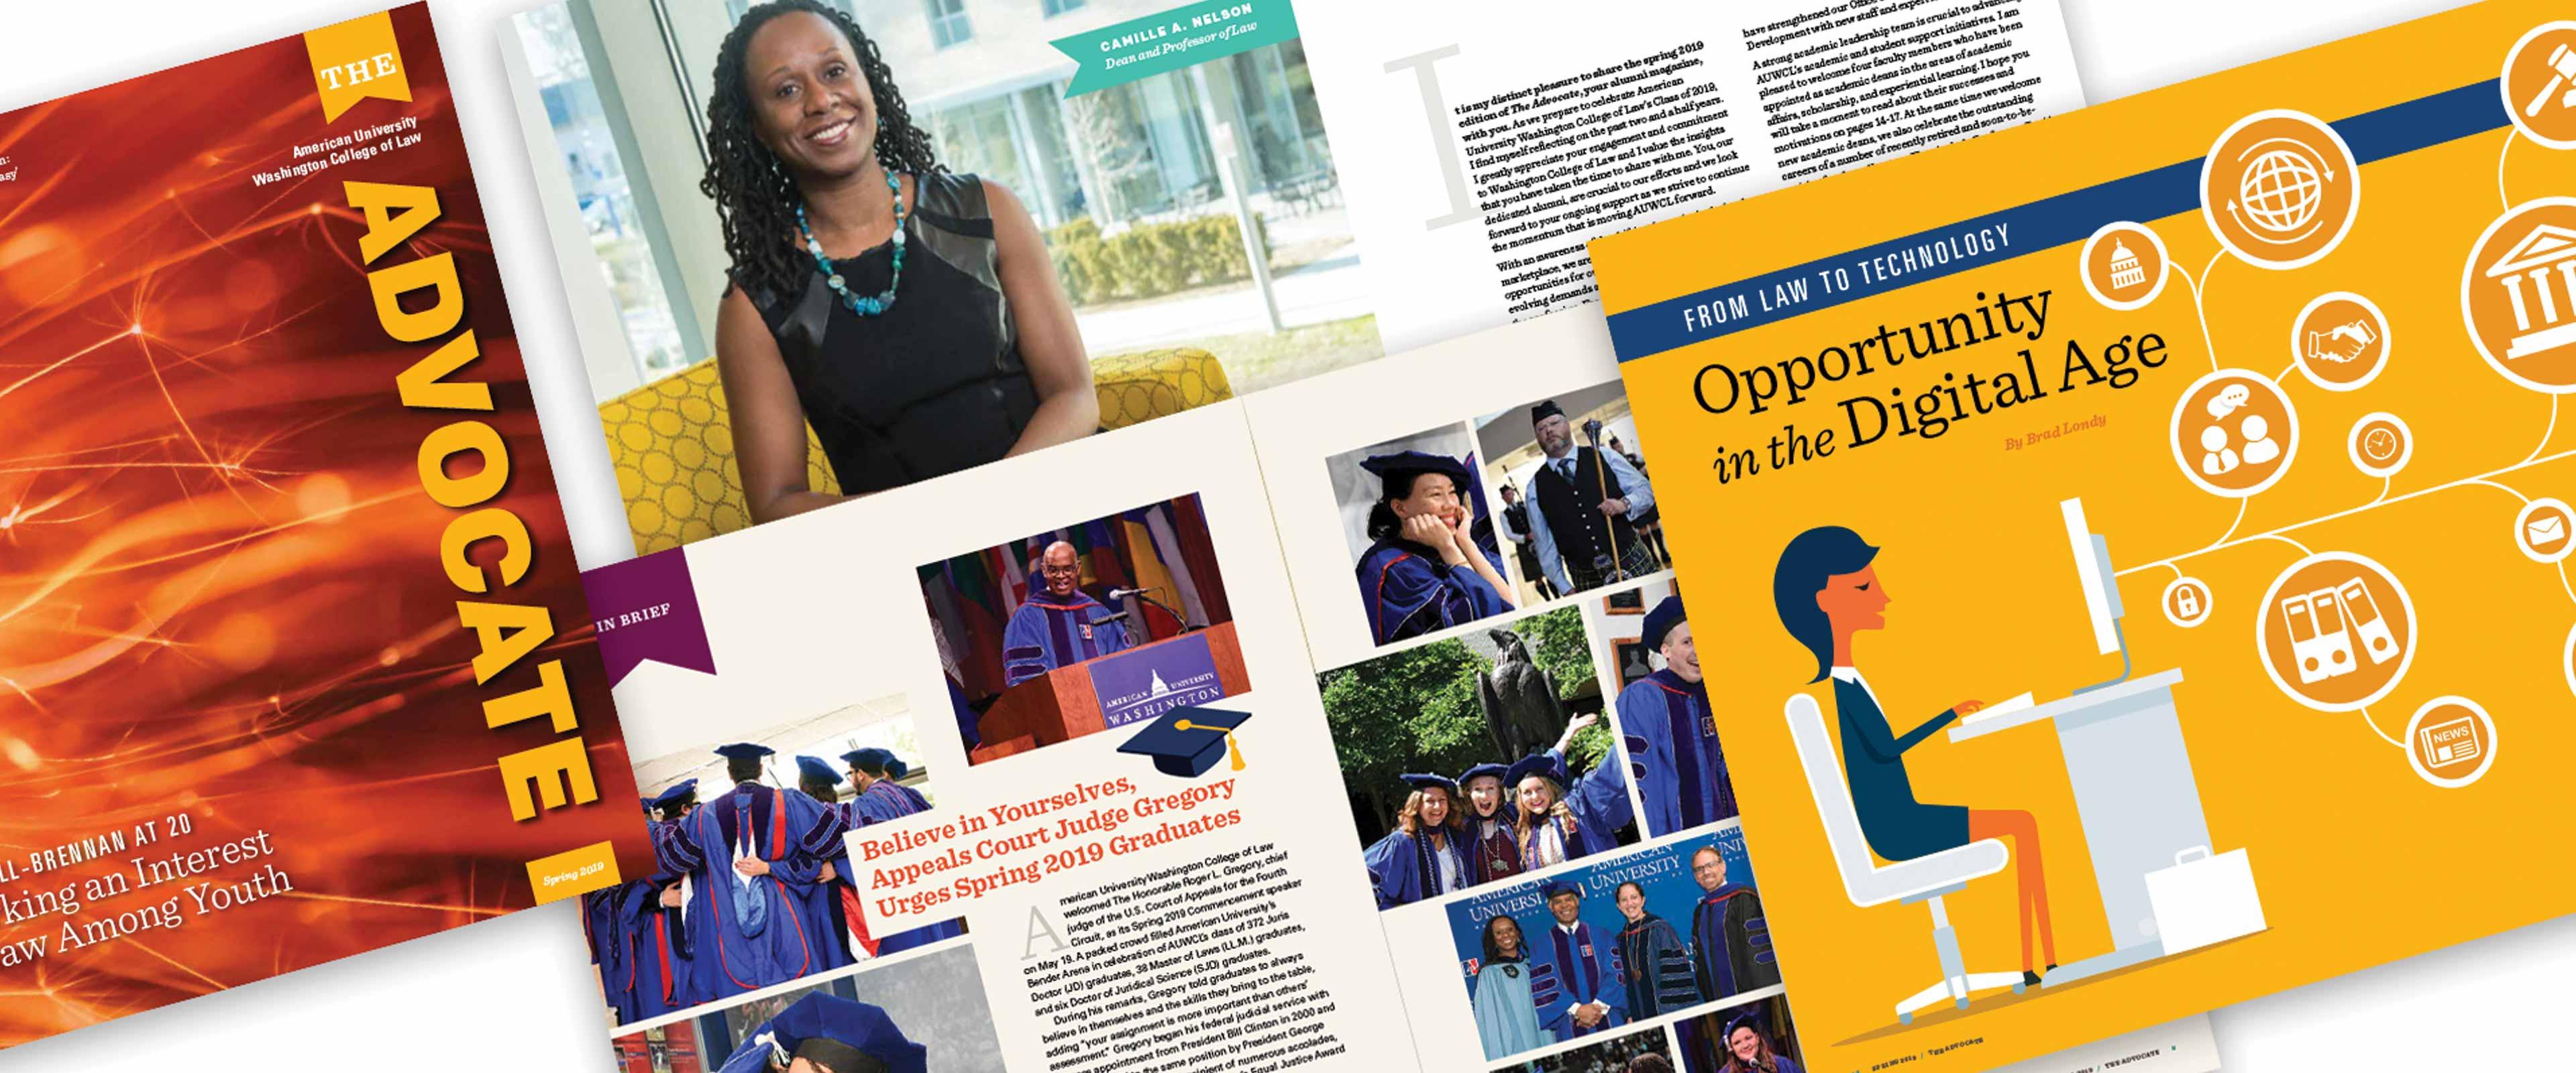 University law school alumni magazine